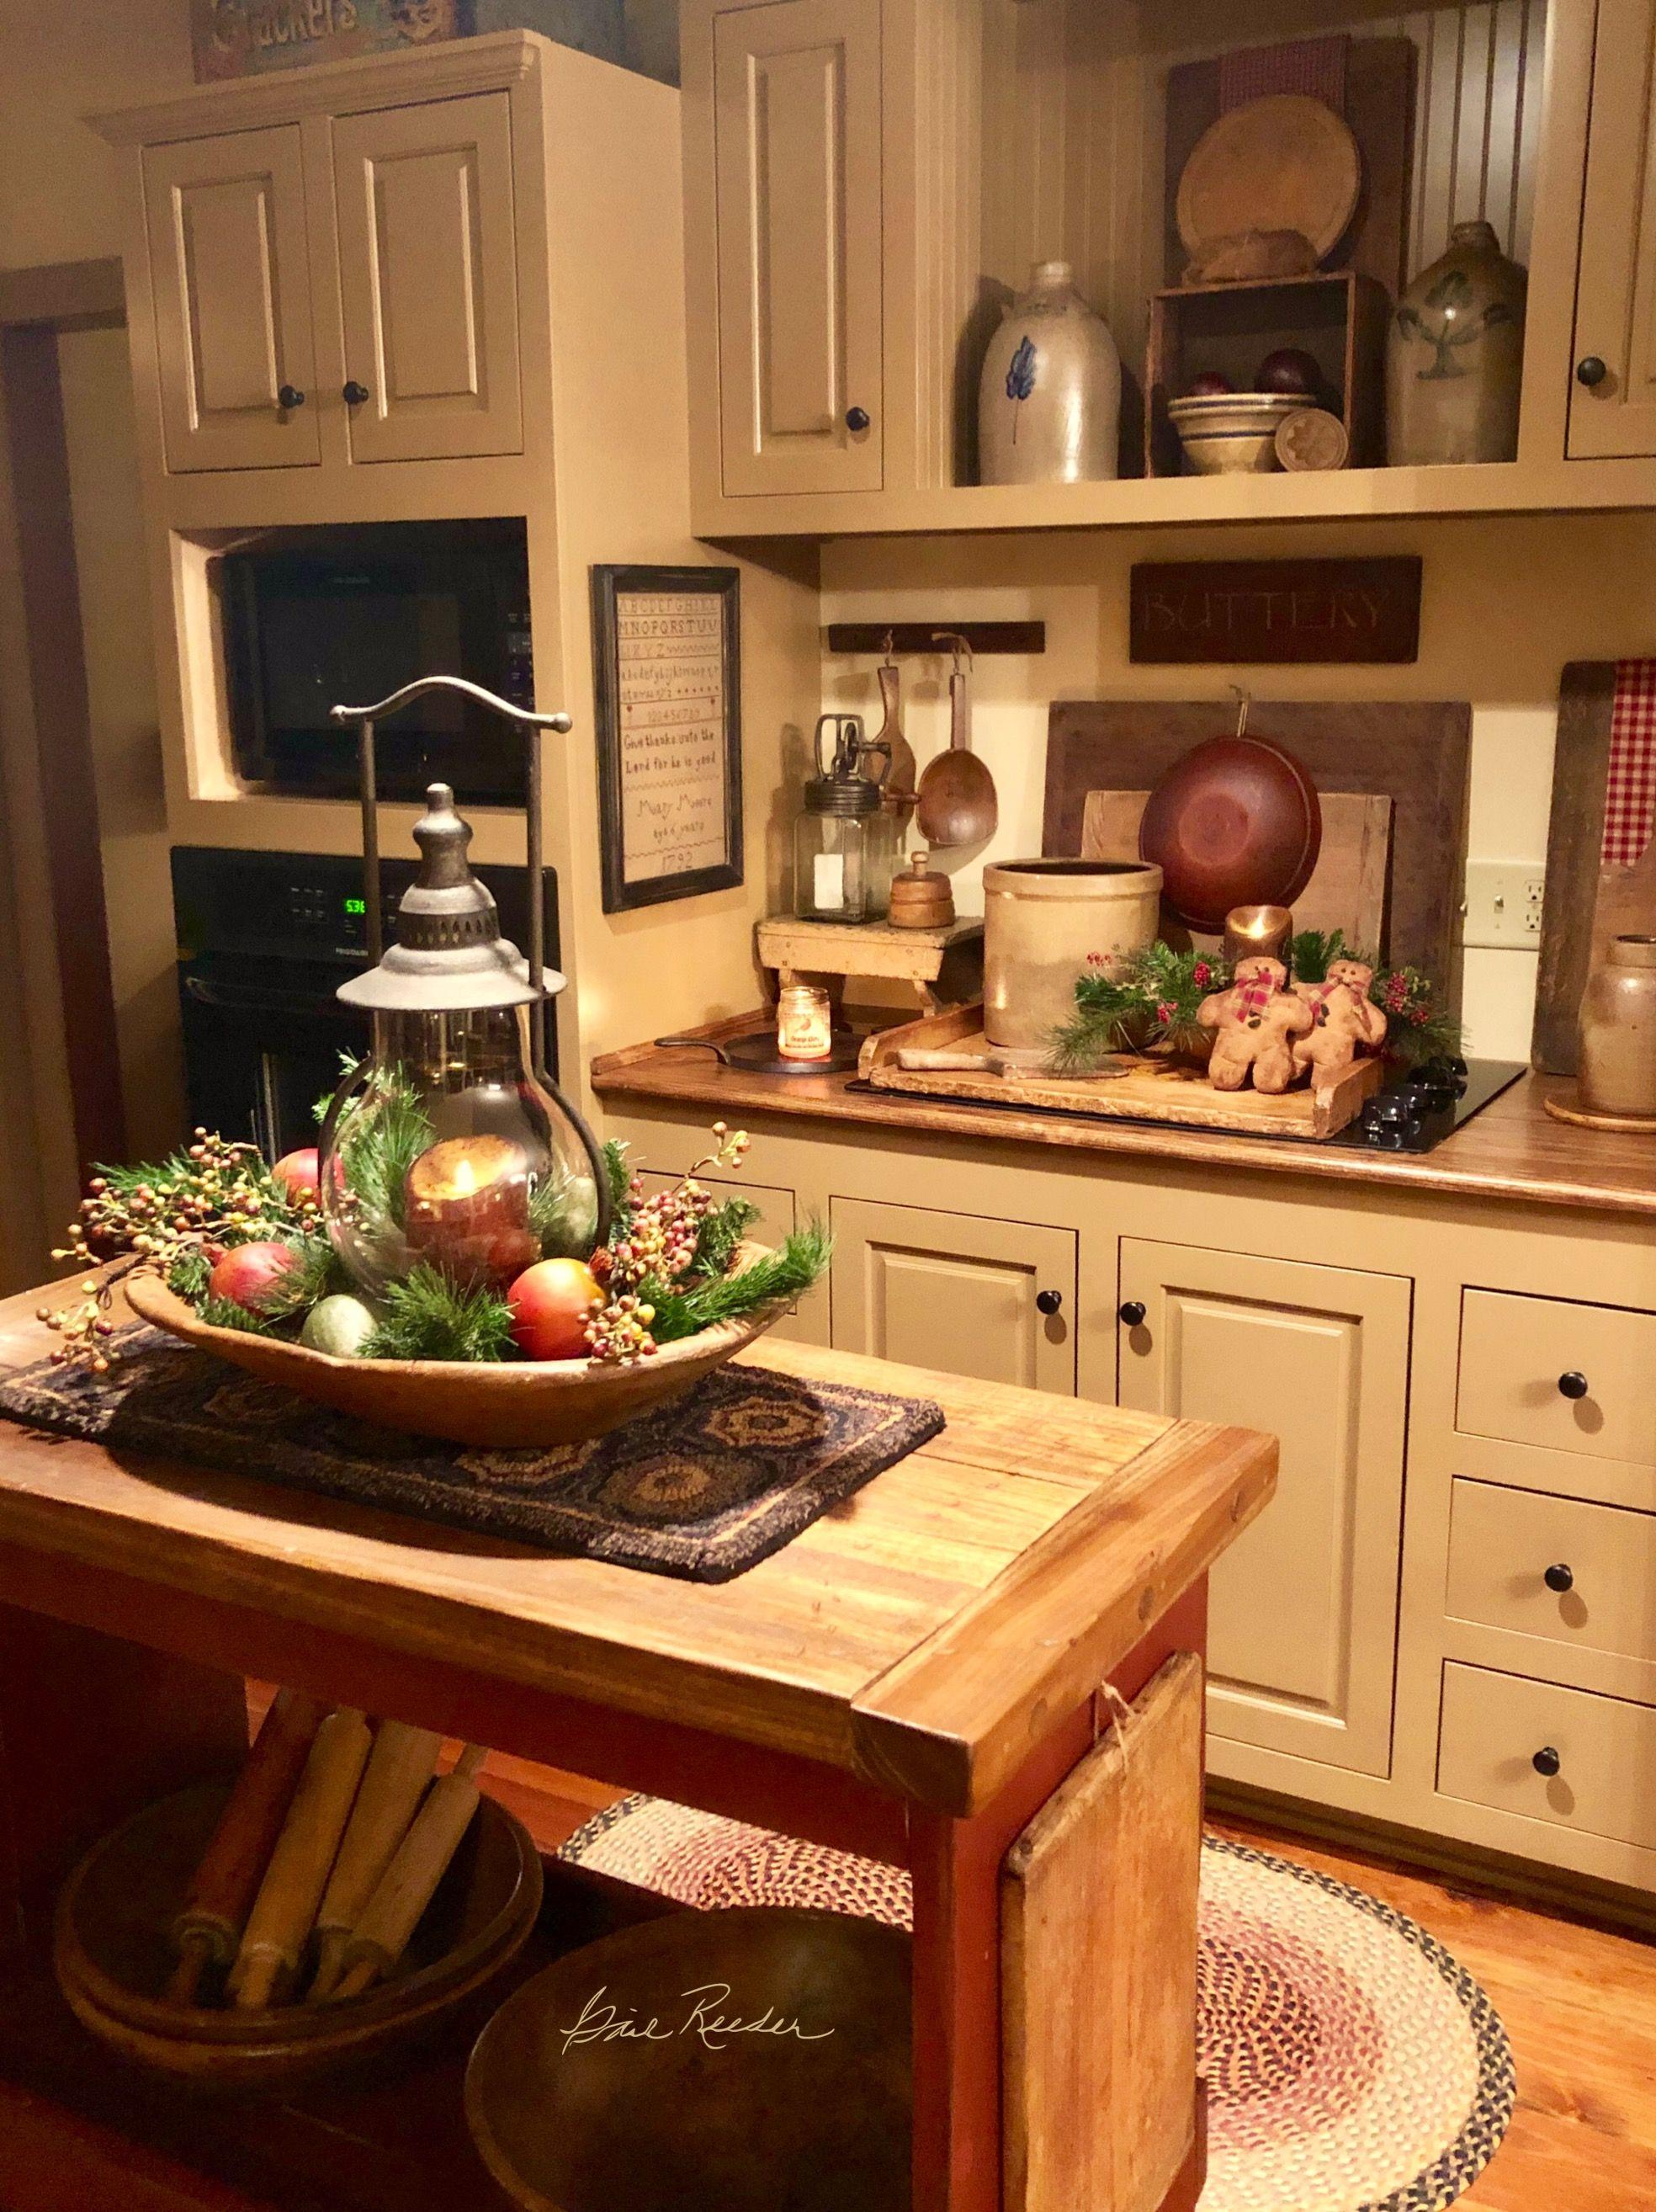 Pin By Suzi Prather On Christmas Kitchens And Displays Primitive Kitchen Decor Primitive Kitchen Primitive Kitchen Cabinets